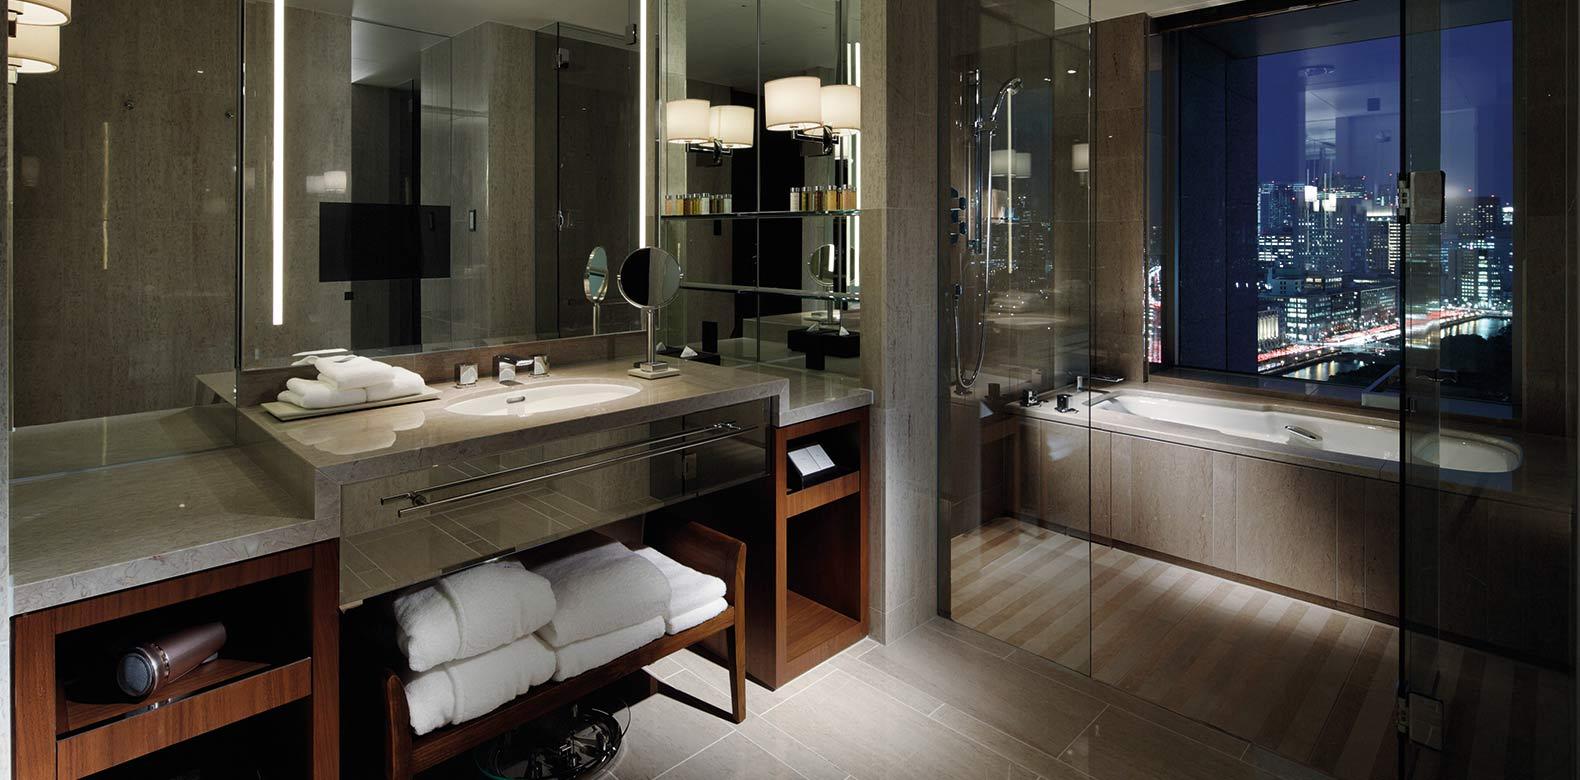 Palace-Hotel-Tokyo-F-Grand-Deluxe-Bathroom Luxury Marunouchi accommodation